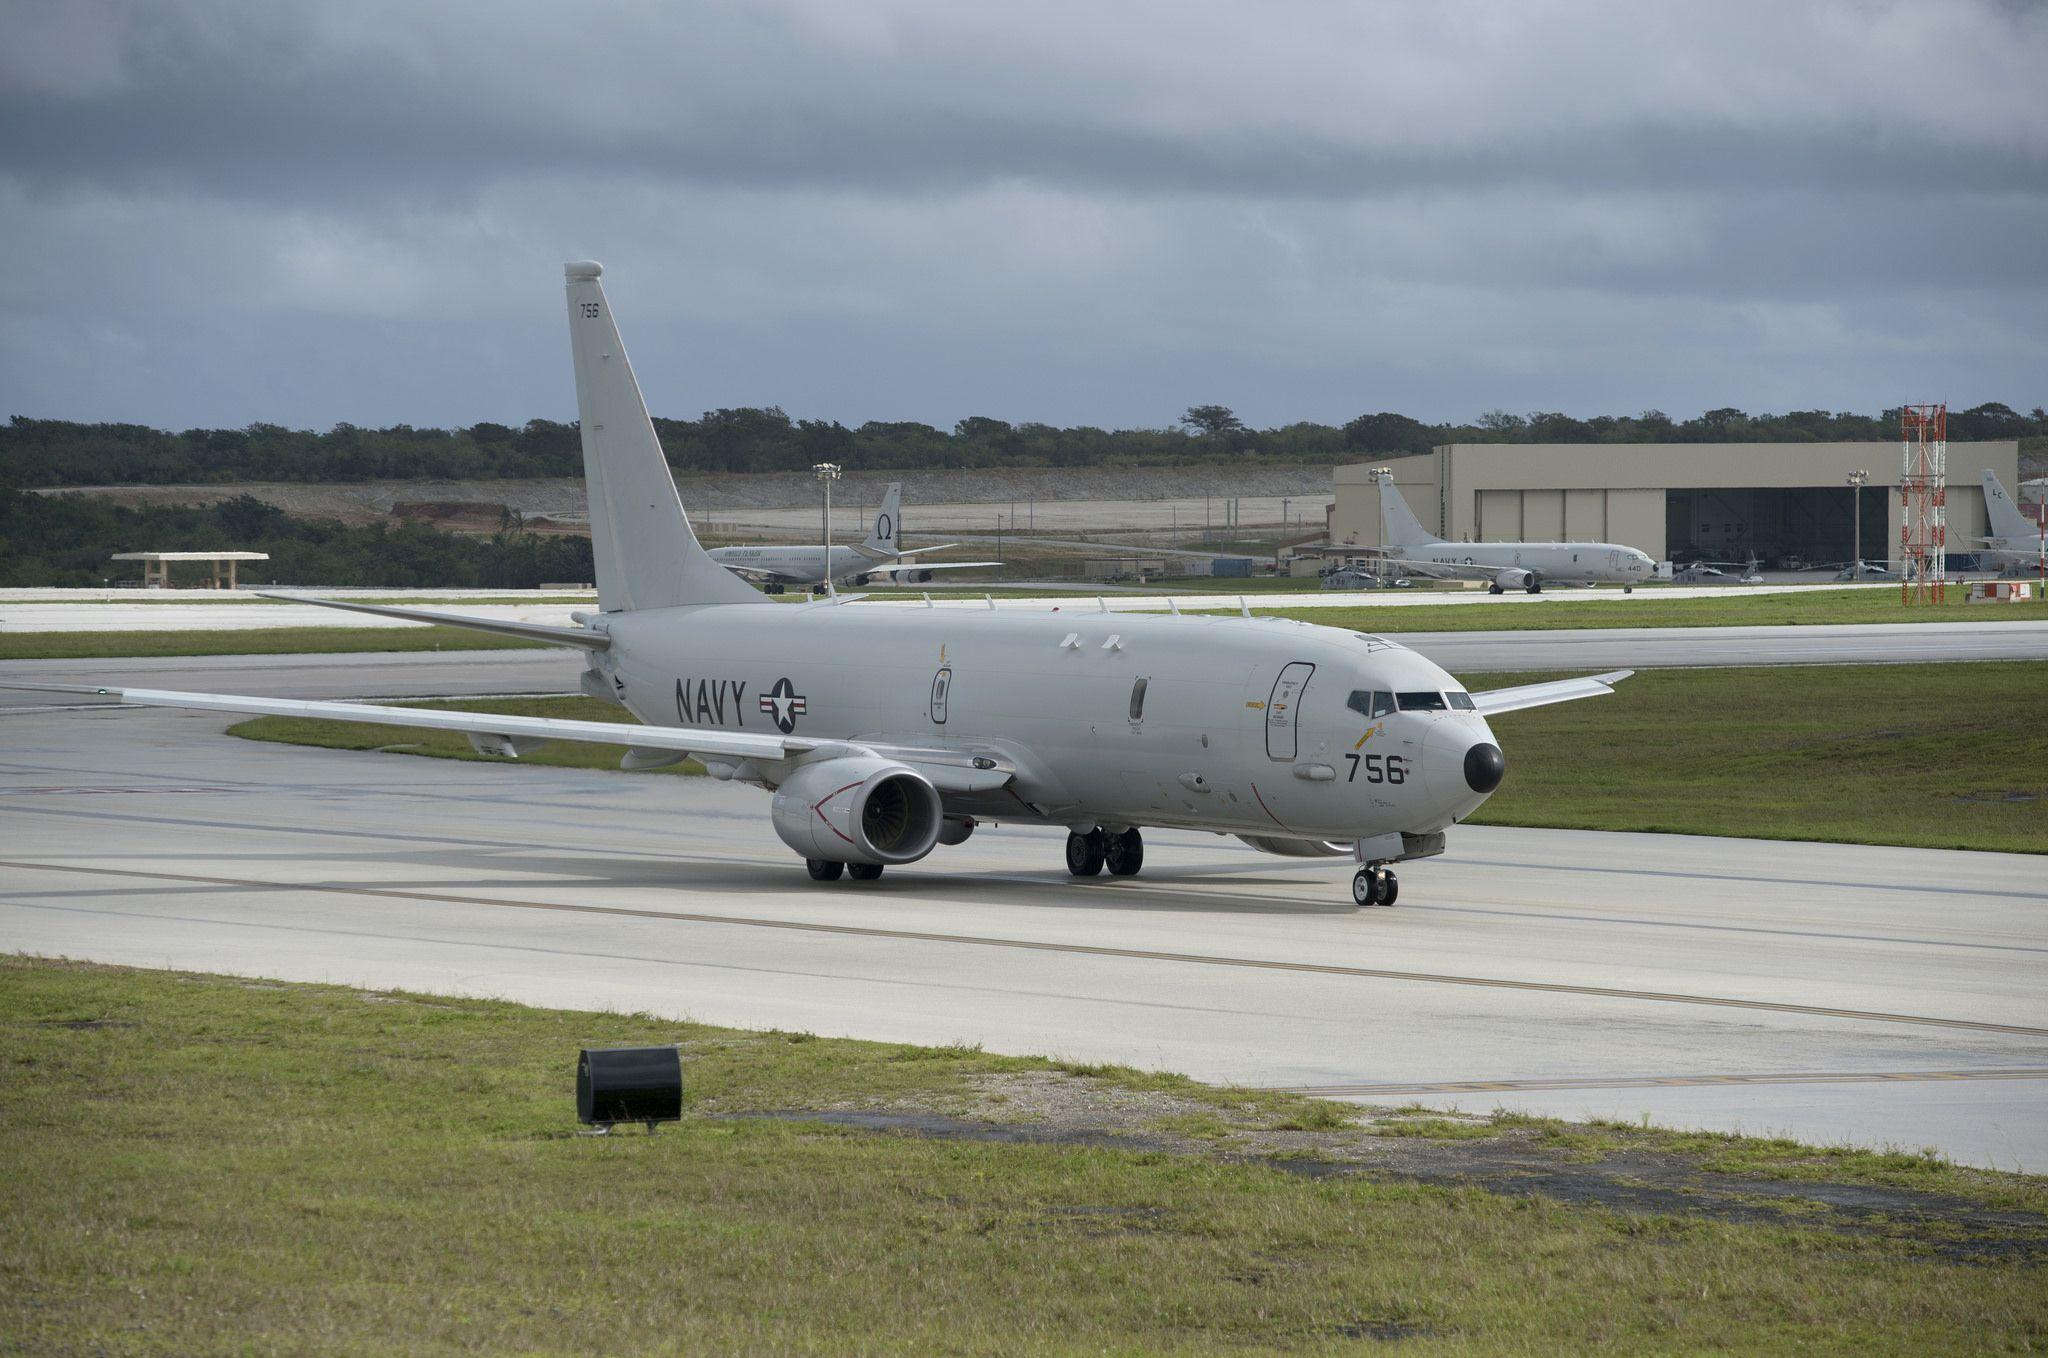 180917NTZ0200132 Military aircraft, Aircraft, Orion